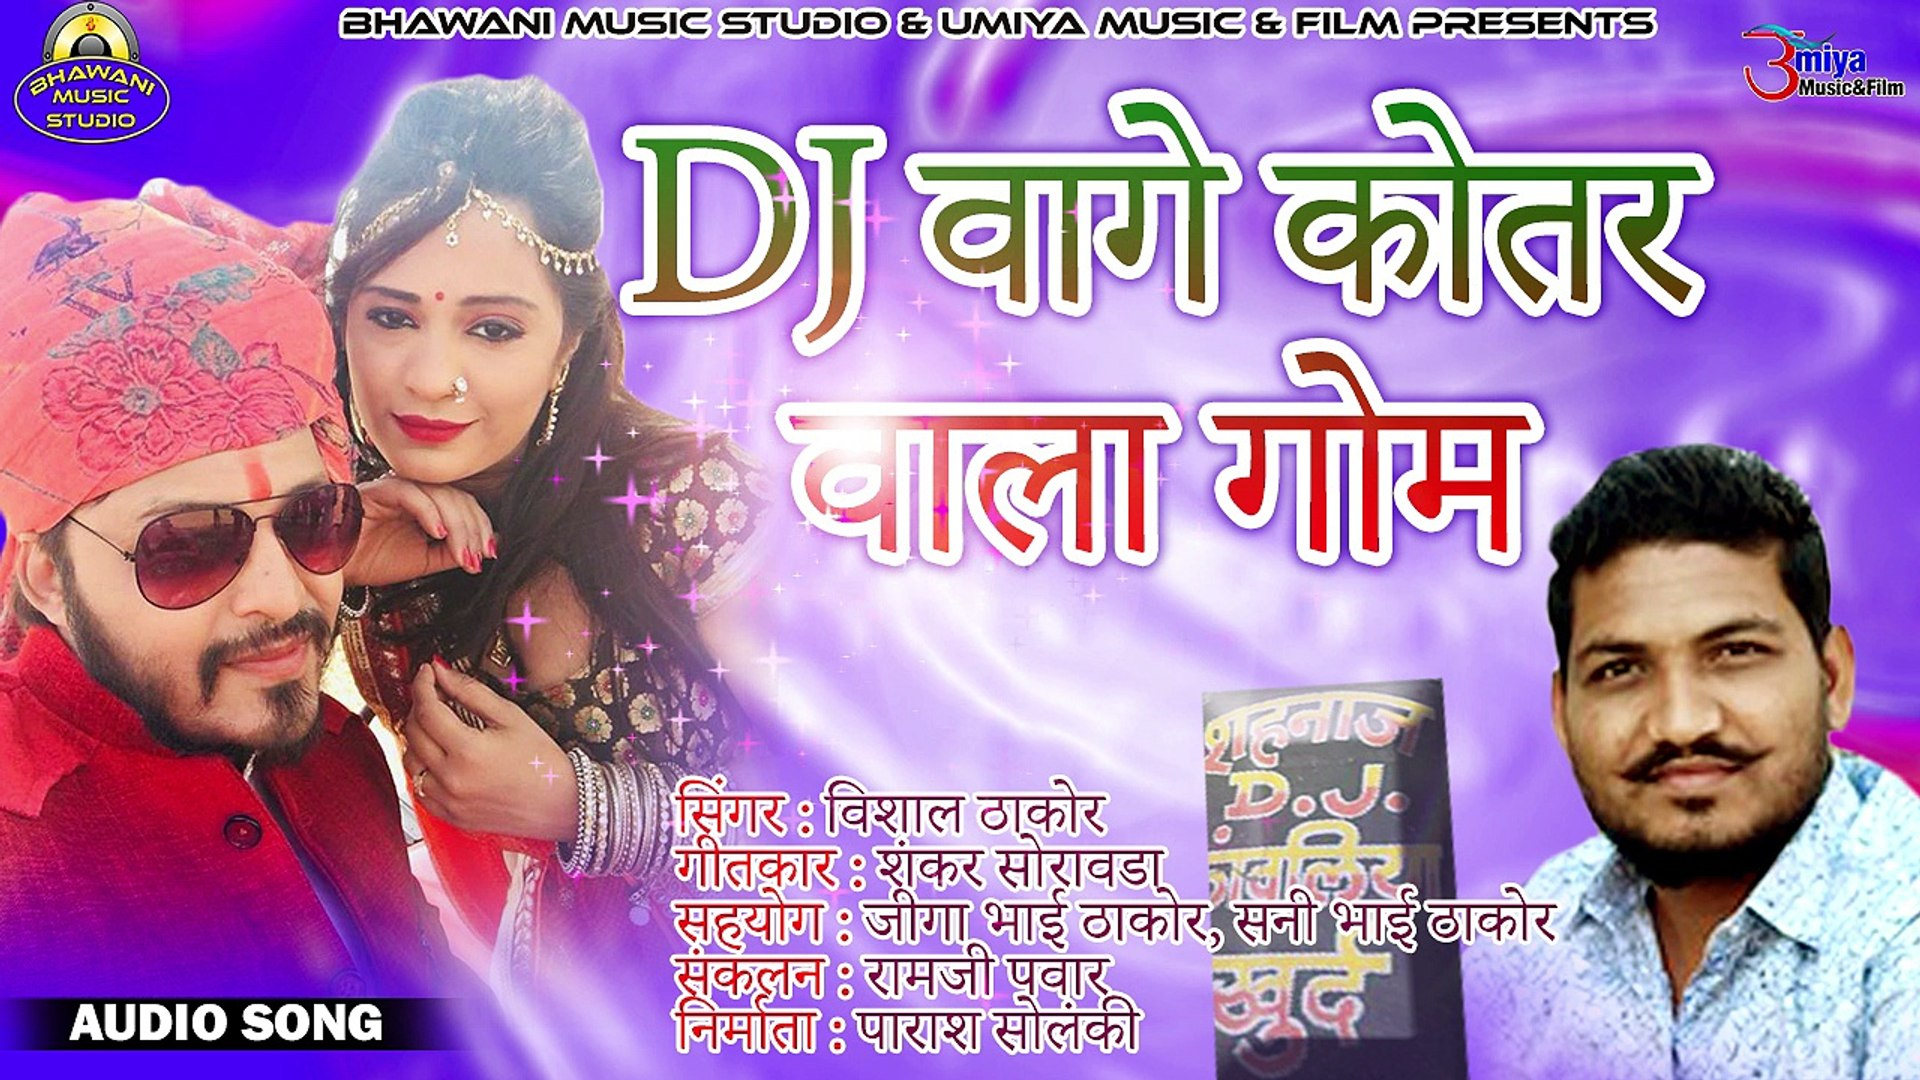 Latest Gujarati Song 2018 | DJ वागे कोतर वाला गोम | FULL Song | Audio | Mp3  | Vishal Thakor New Song | Anita Films | ગુજરાતી ગીત